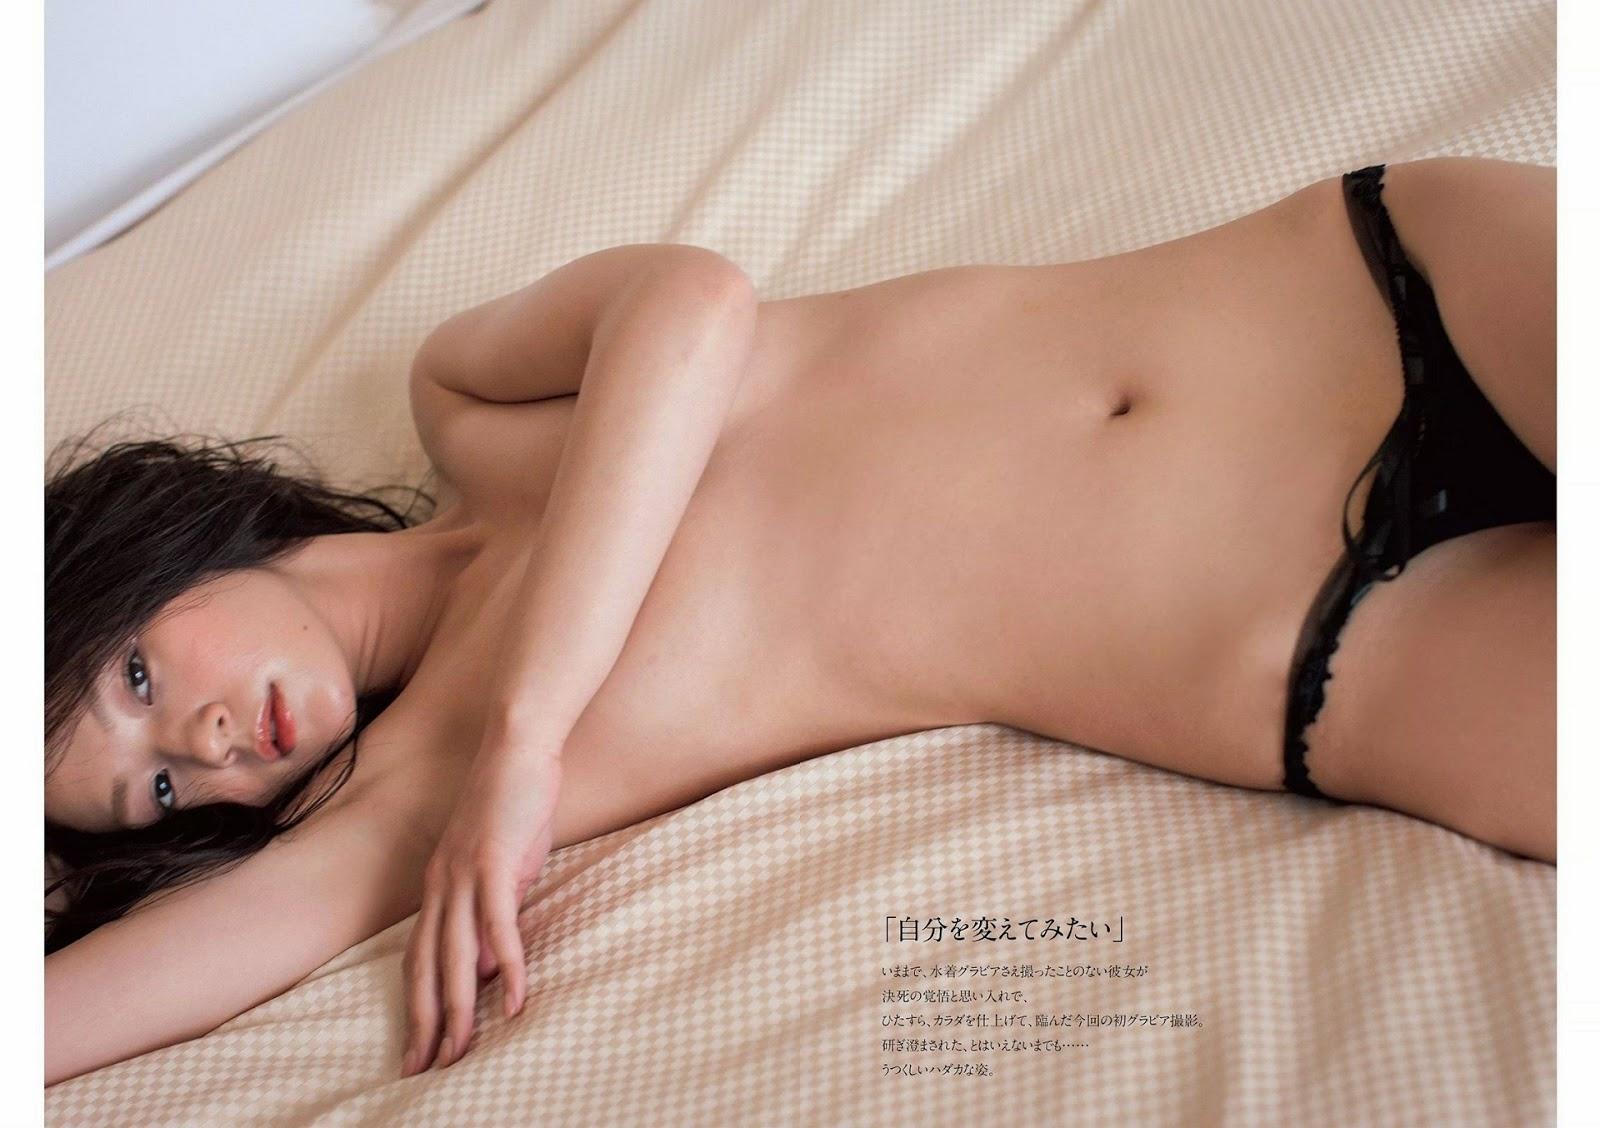 Hosoya Rena 細谷レナ Weekly Playboy 週刊プレイボーイ No 18 2015 Wallpaper HD